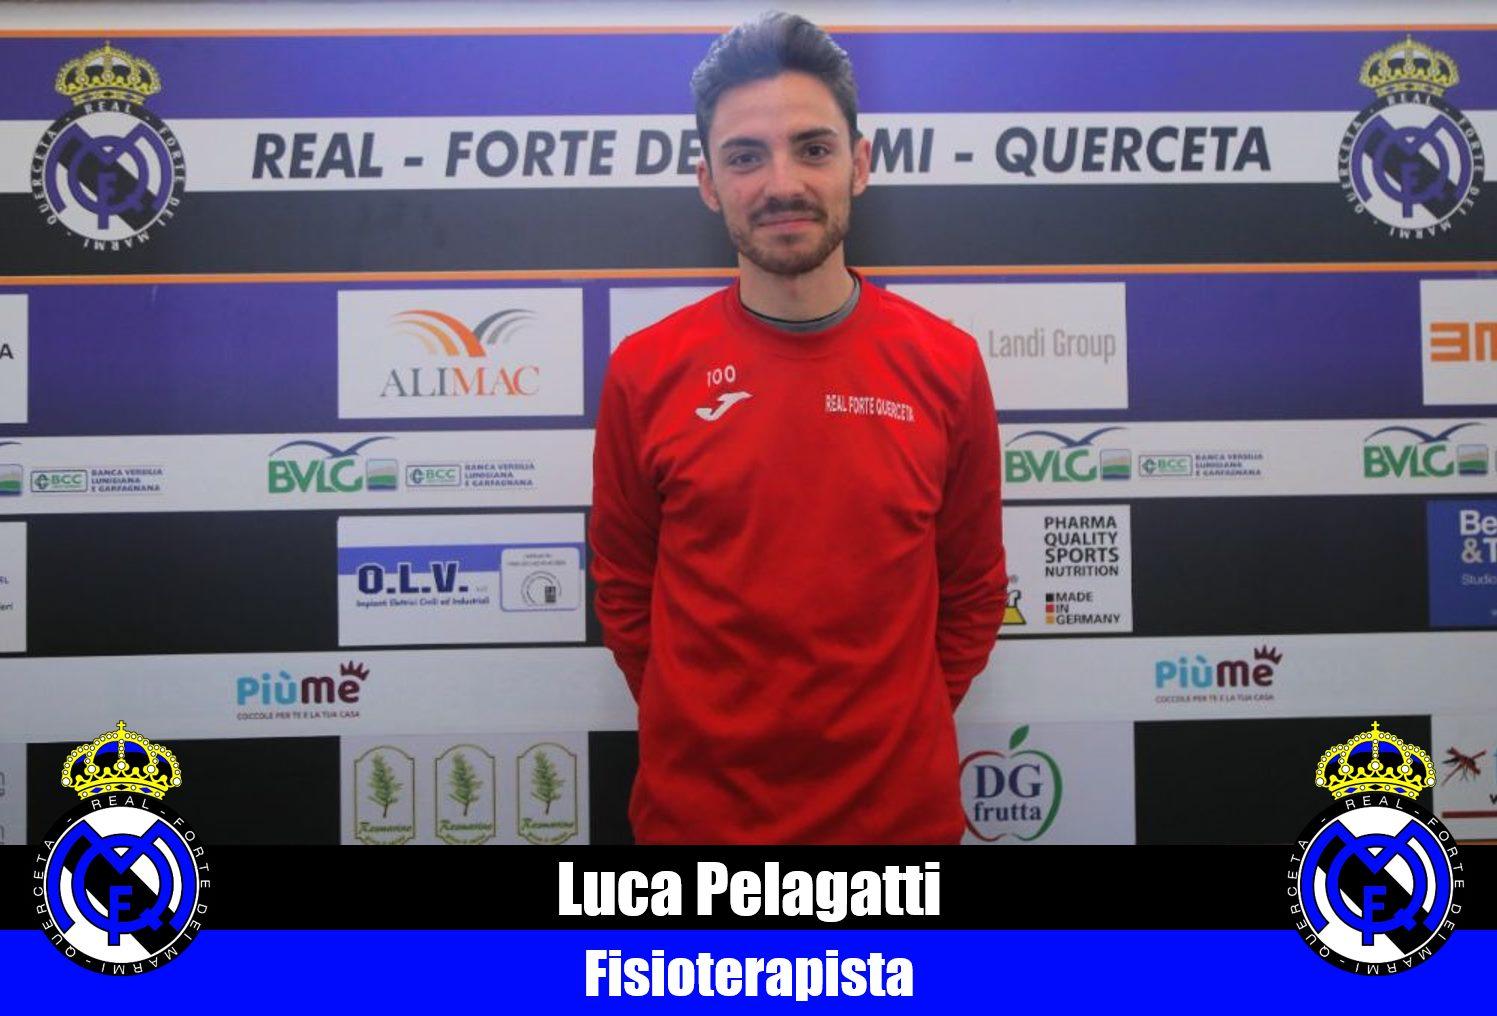 Serie D, Real Forte Querceta, Luca Pelagatti nuovo fisioterapista